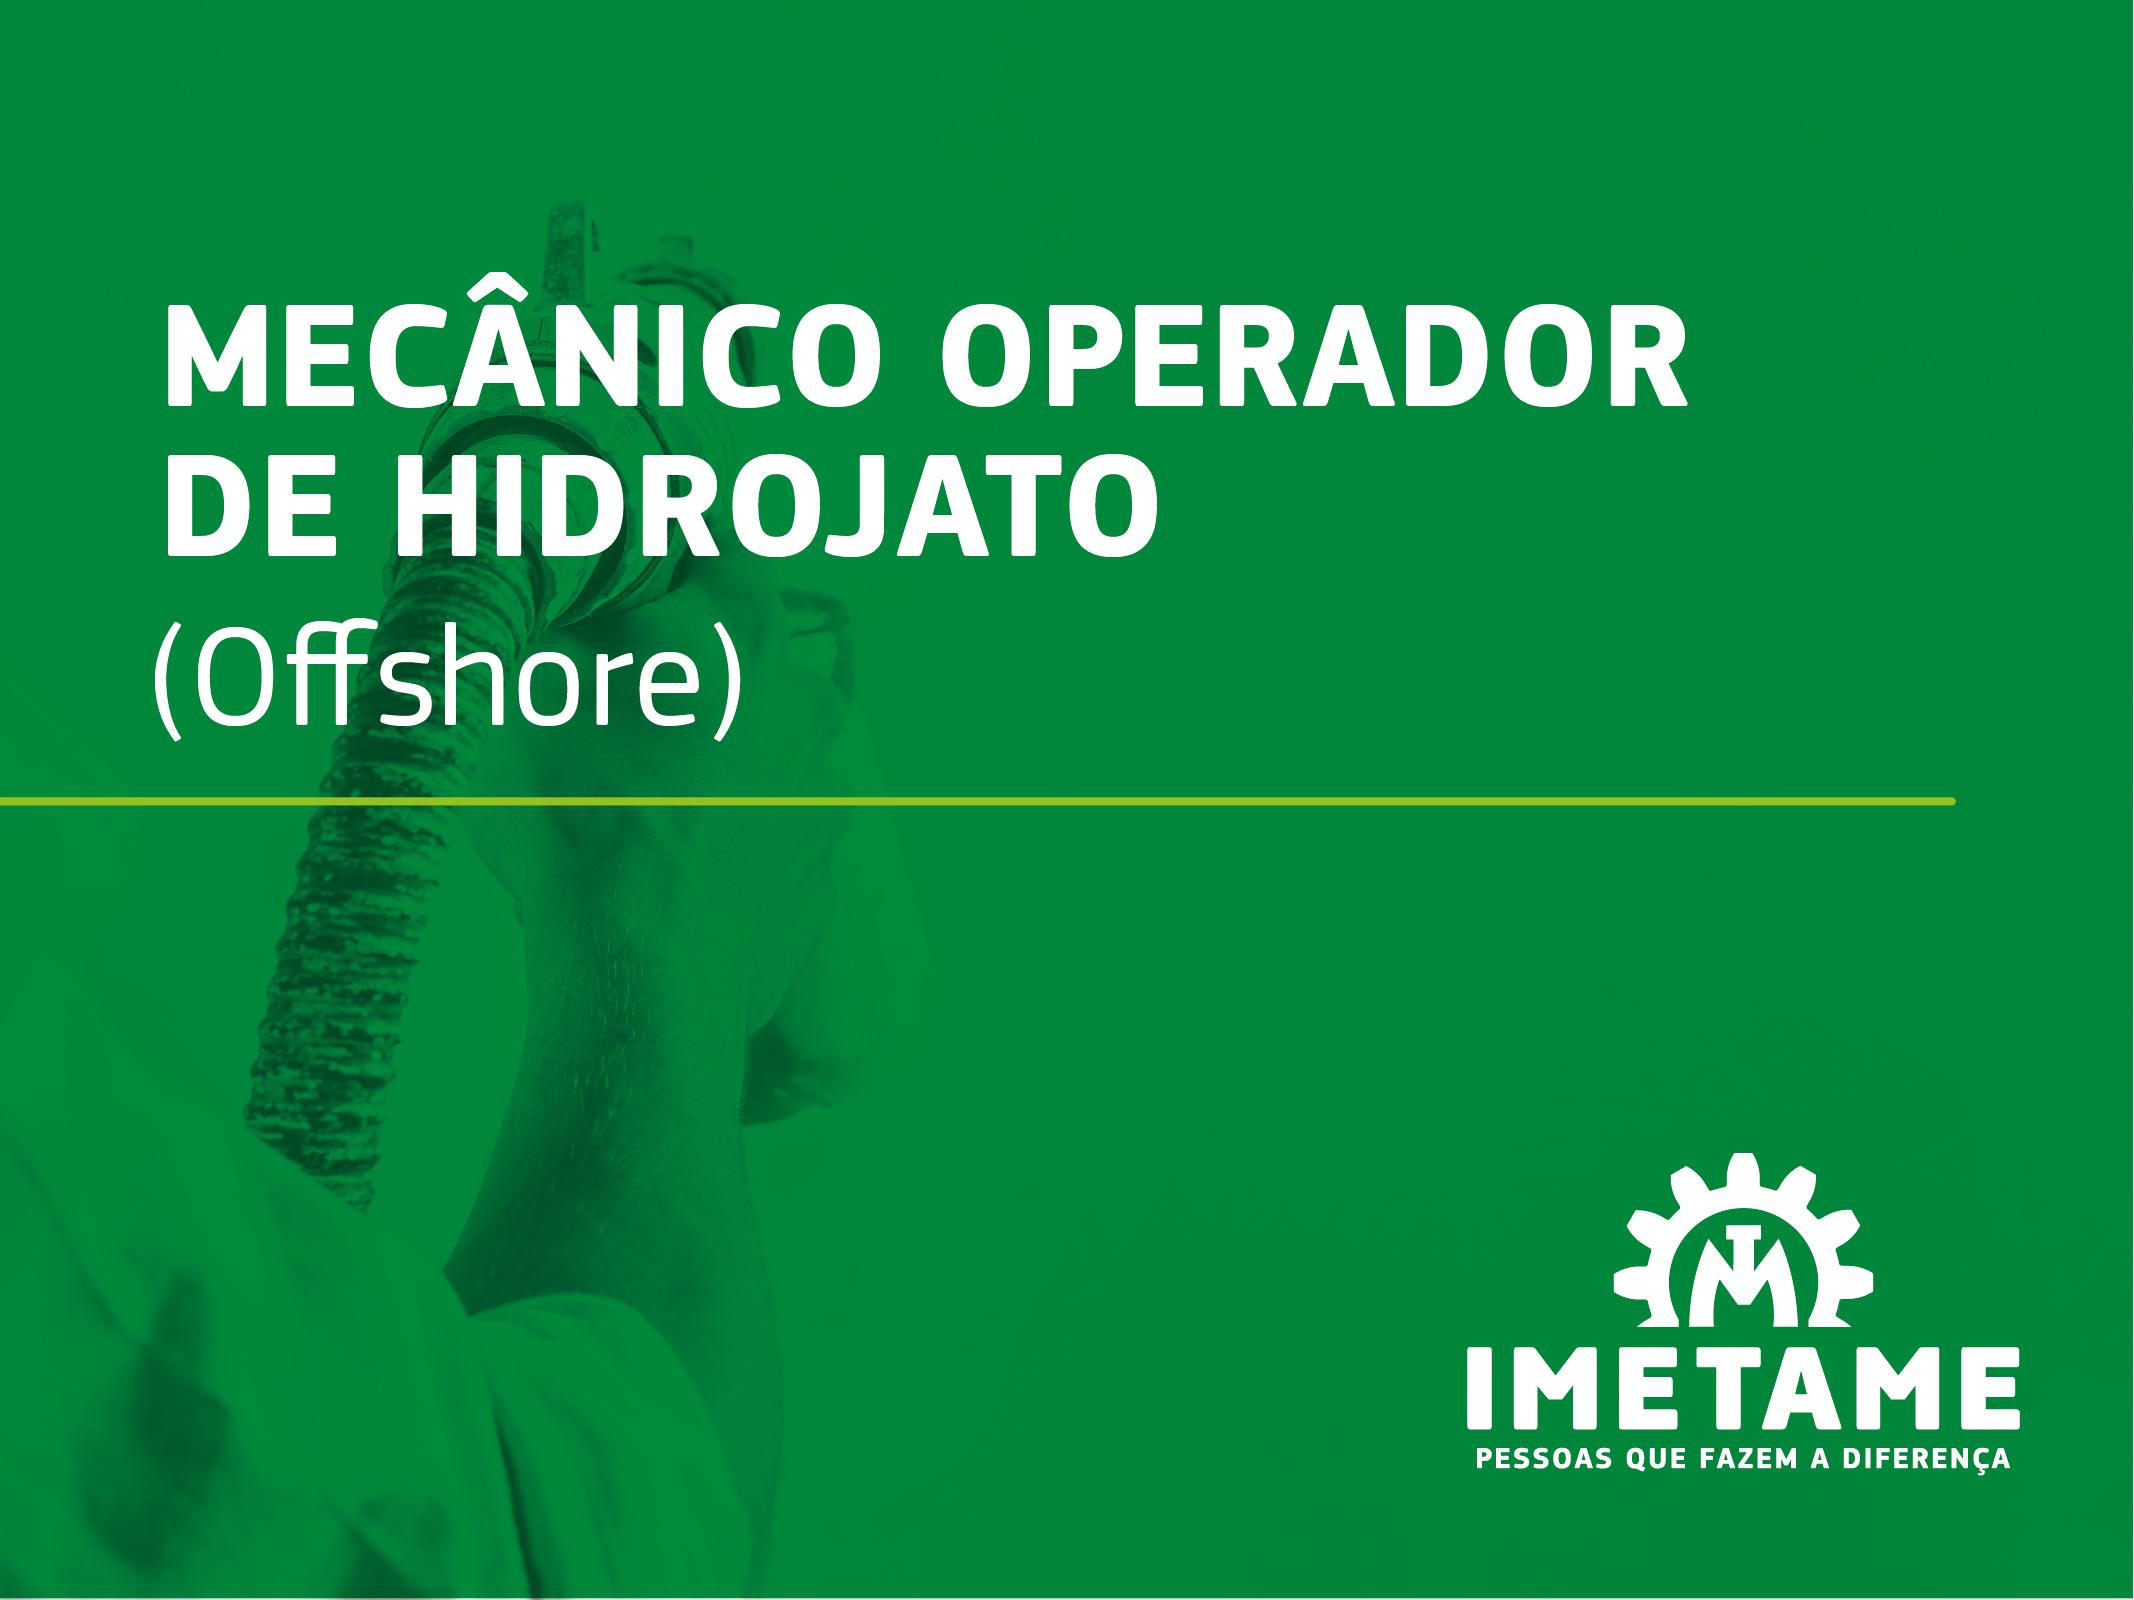 Mecânico Operador de Hidrojato – Offshore